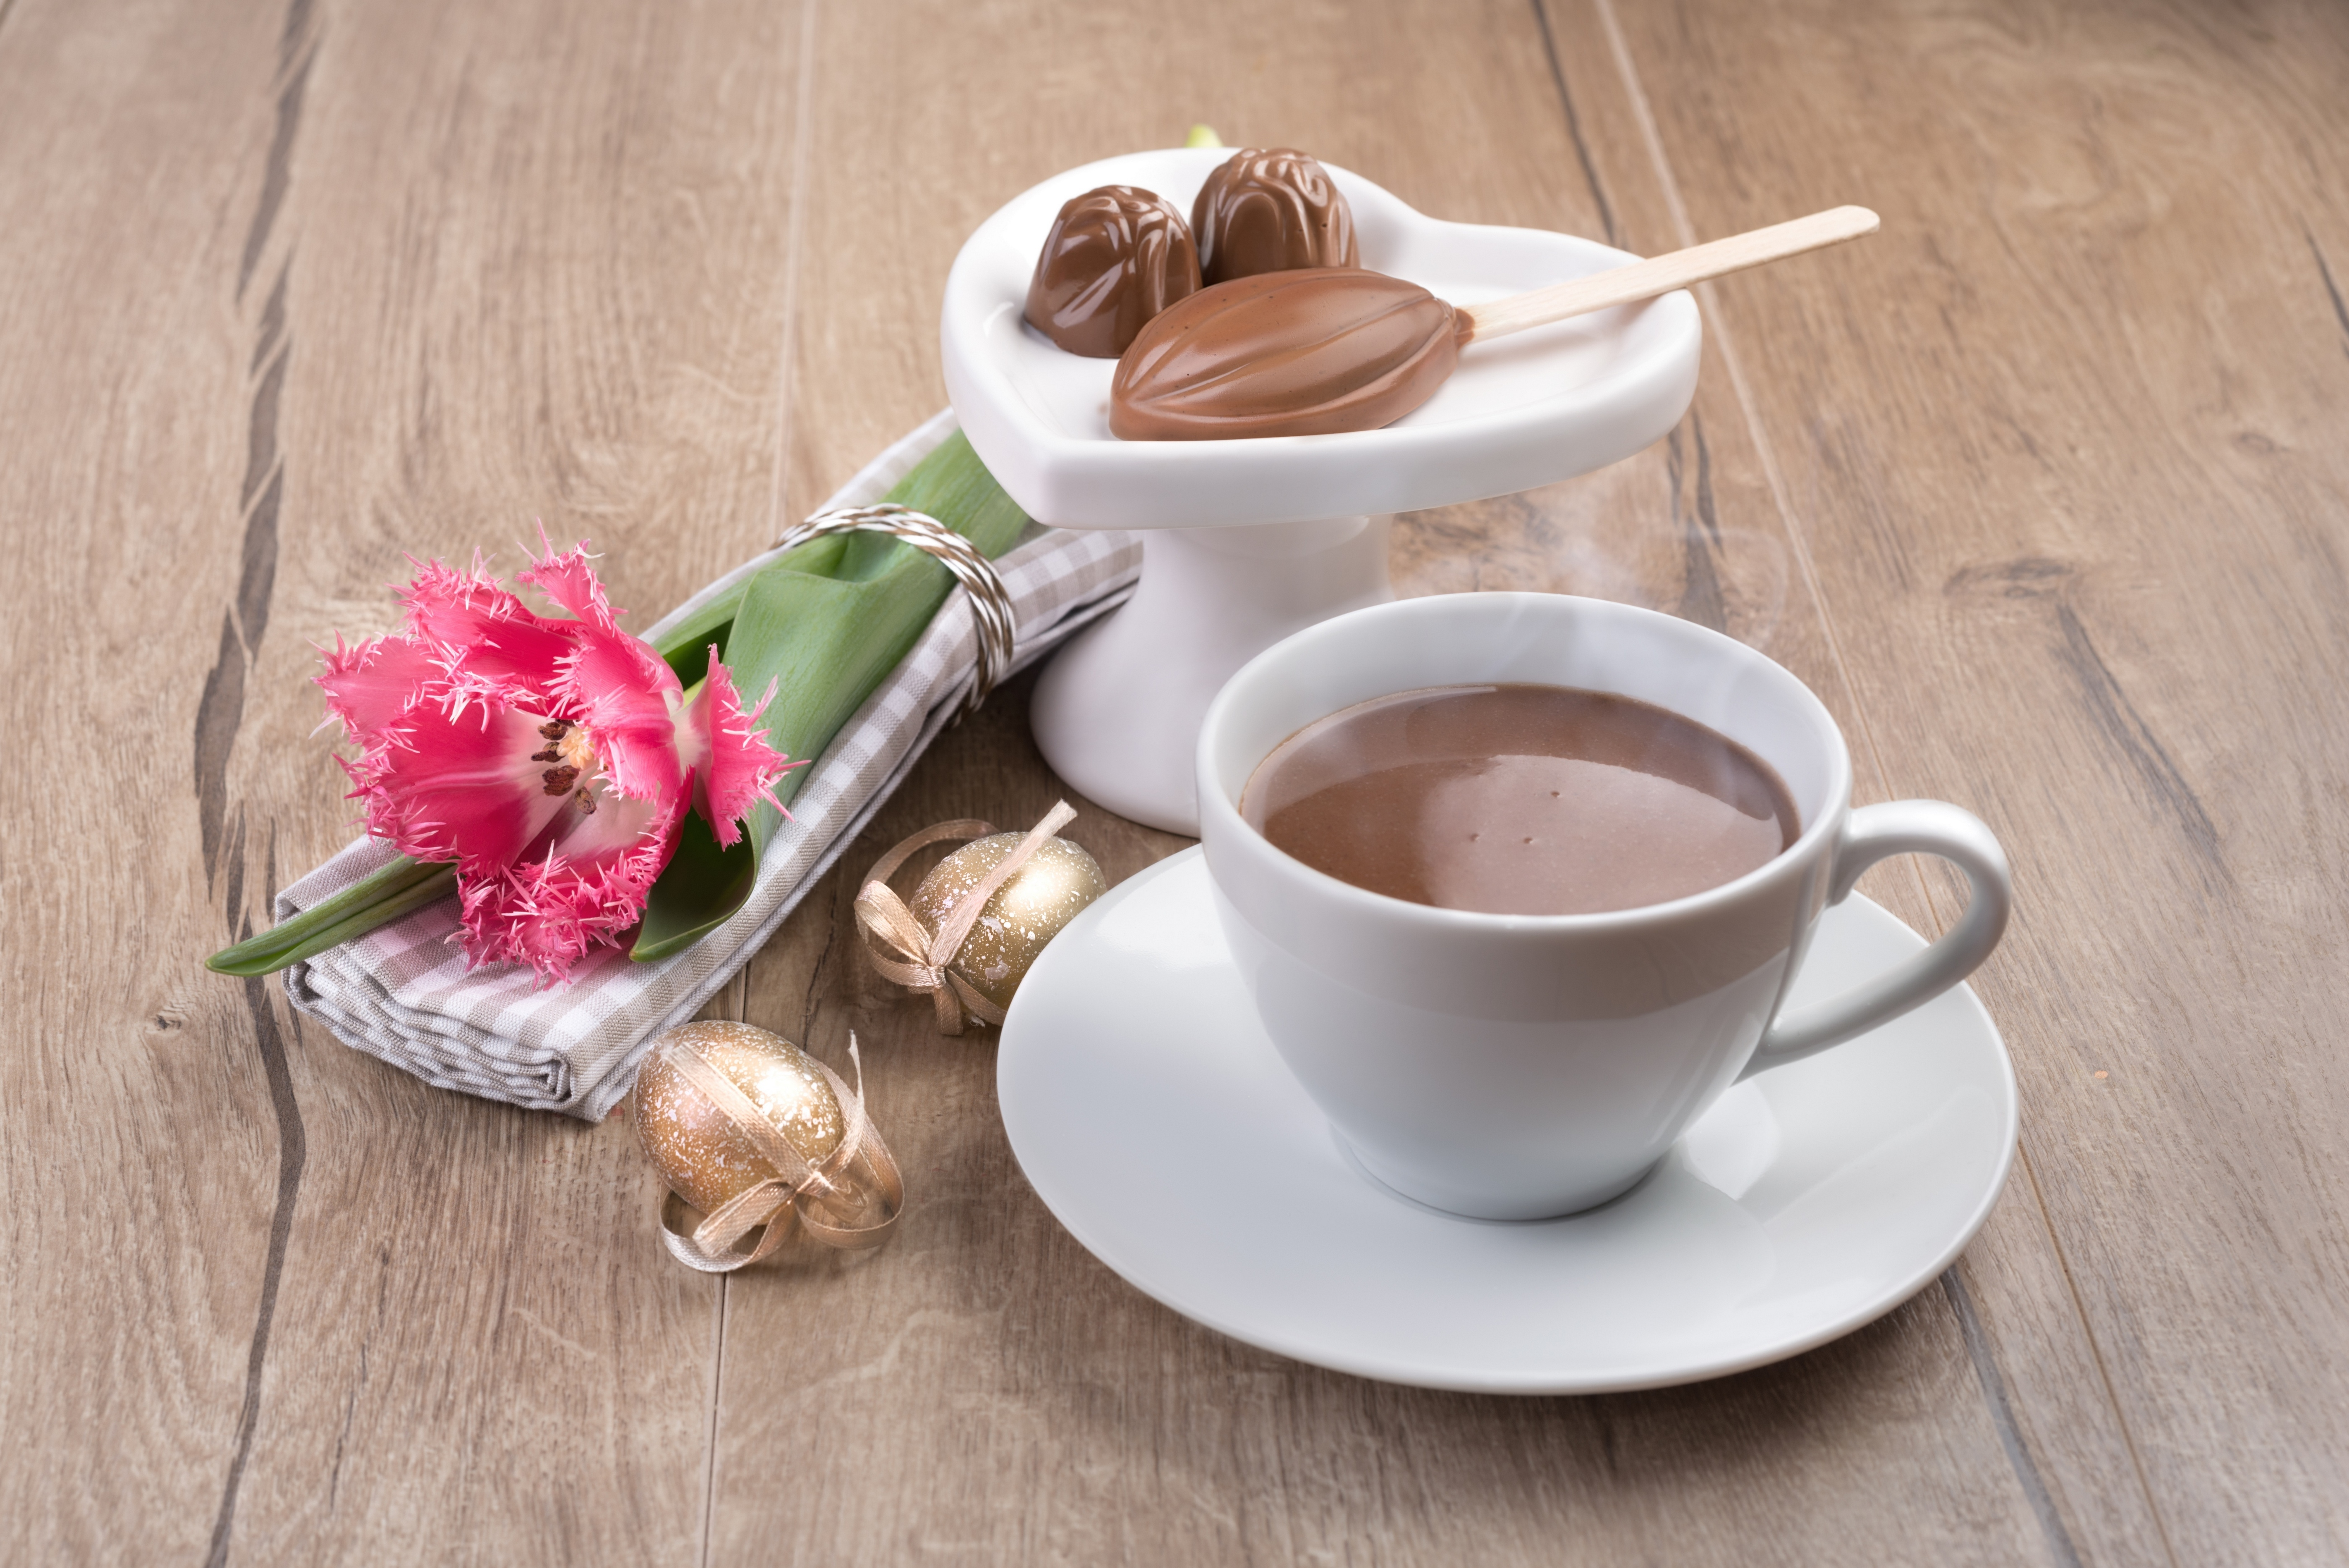 Картинки утро цветы шоколад